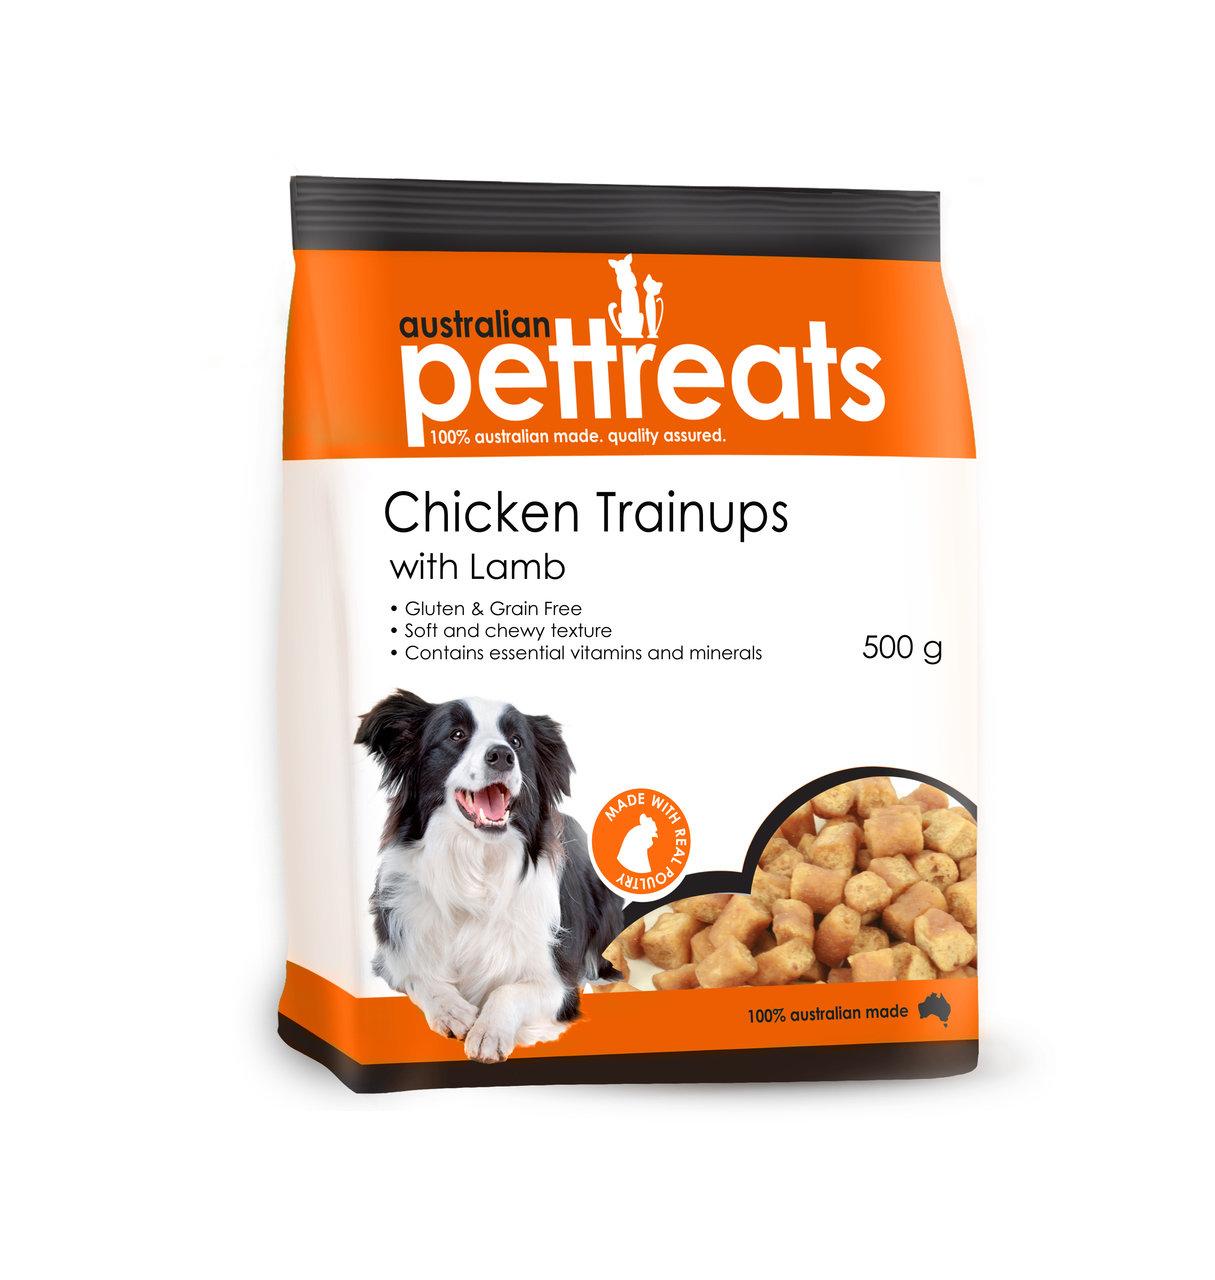 Chicken Trainups with Lamb Gluten and Grain Free